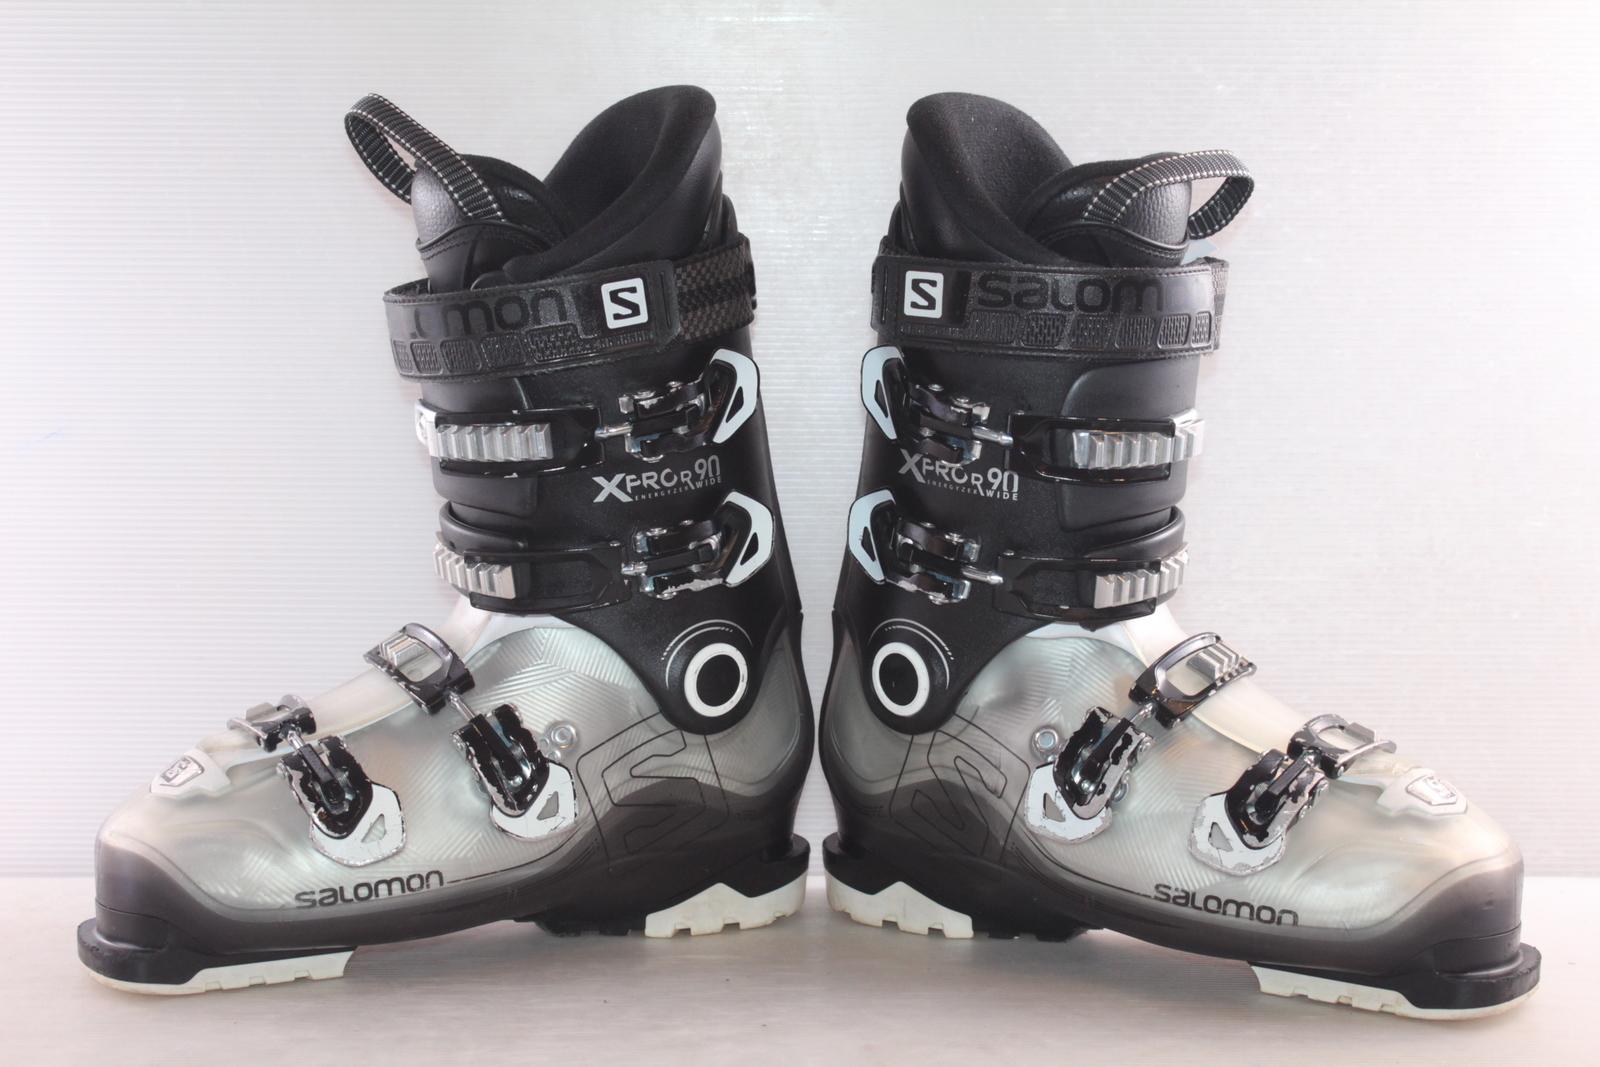 Lyžařské boty Salomon X Pro R90 wide vel. EU42.5 flexe 90